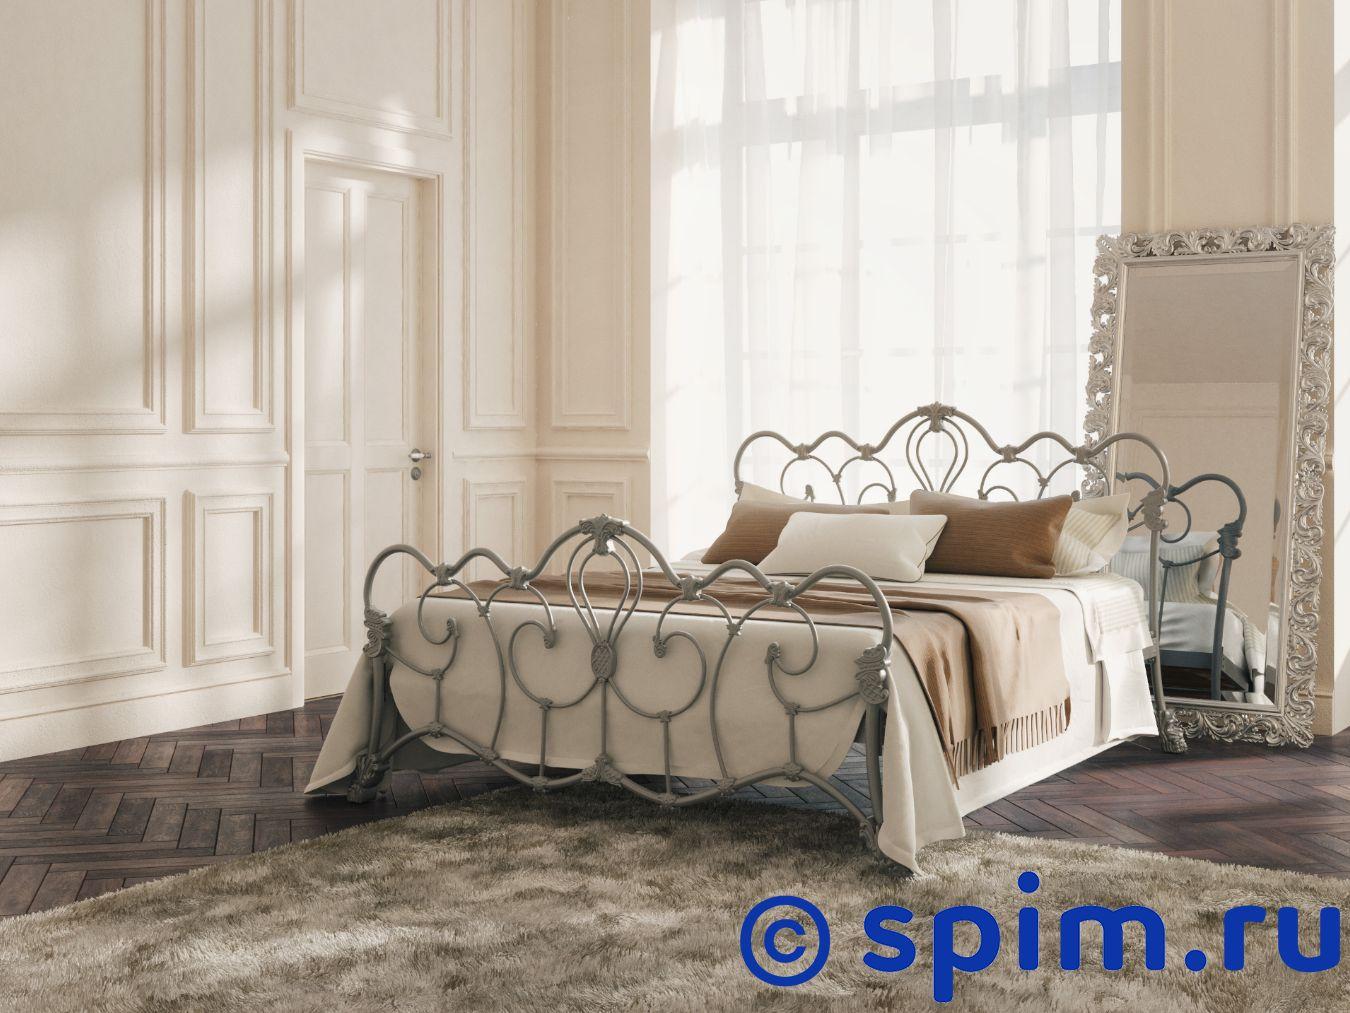 Кровать Originals by Dreamline Michelle (2 спинки) 140х200 см матрас dreamline springless soft slim 90х195 см